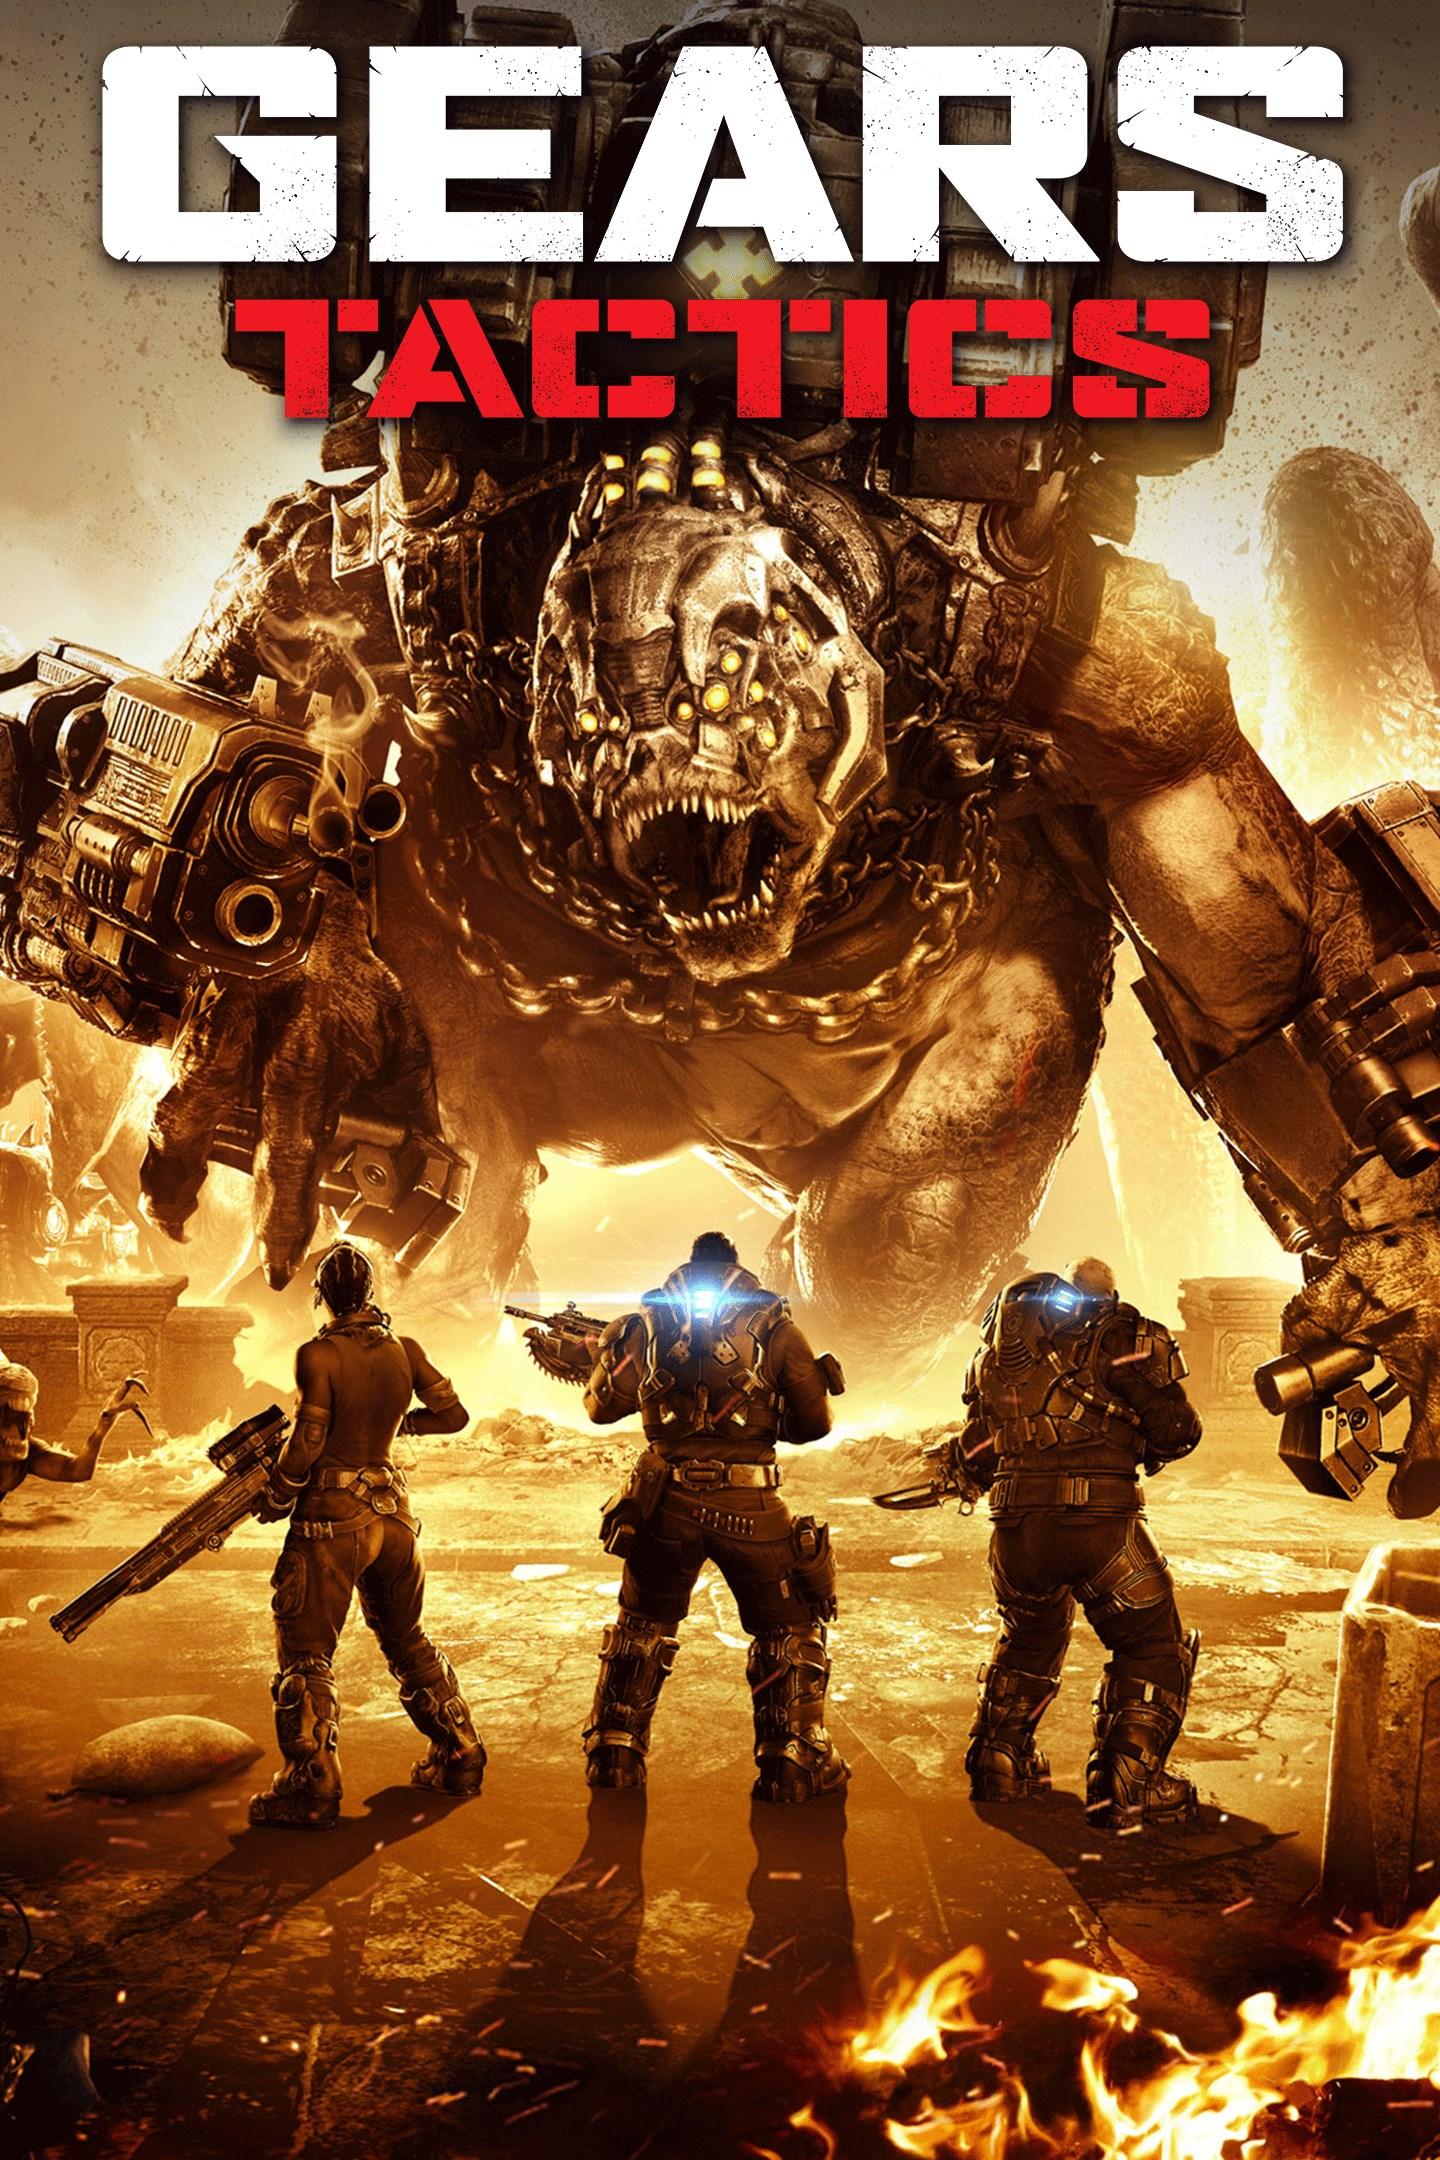 A Treyarch 24 órával. Master Chief nem veszi le a sisakját a Halo 5: Guardiansban · Master Chief nem veszi le.